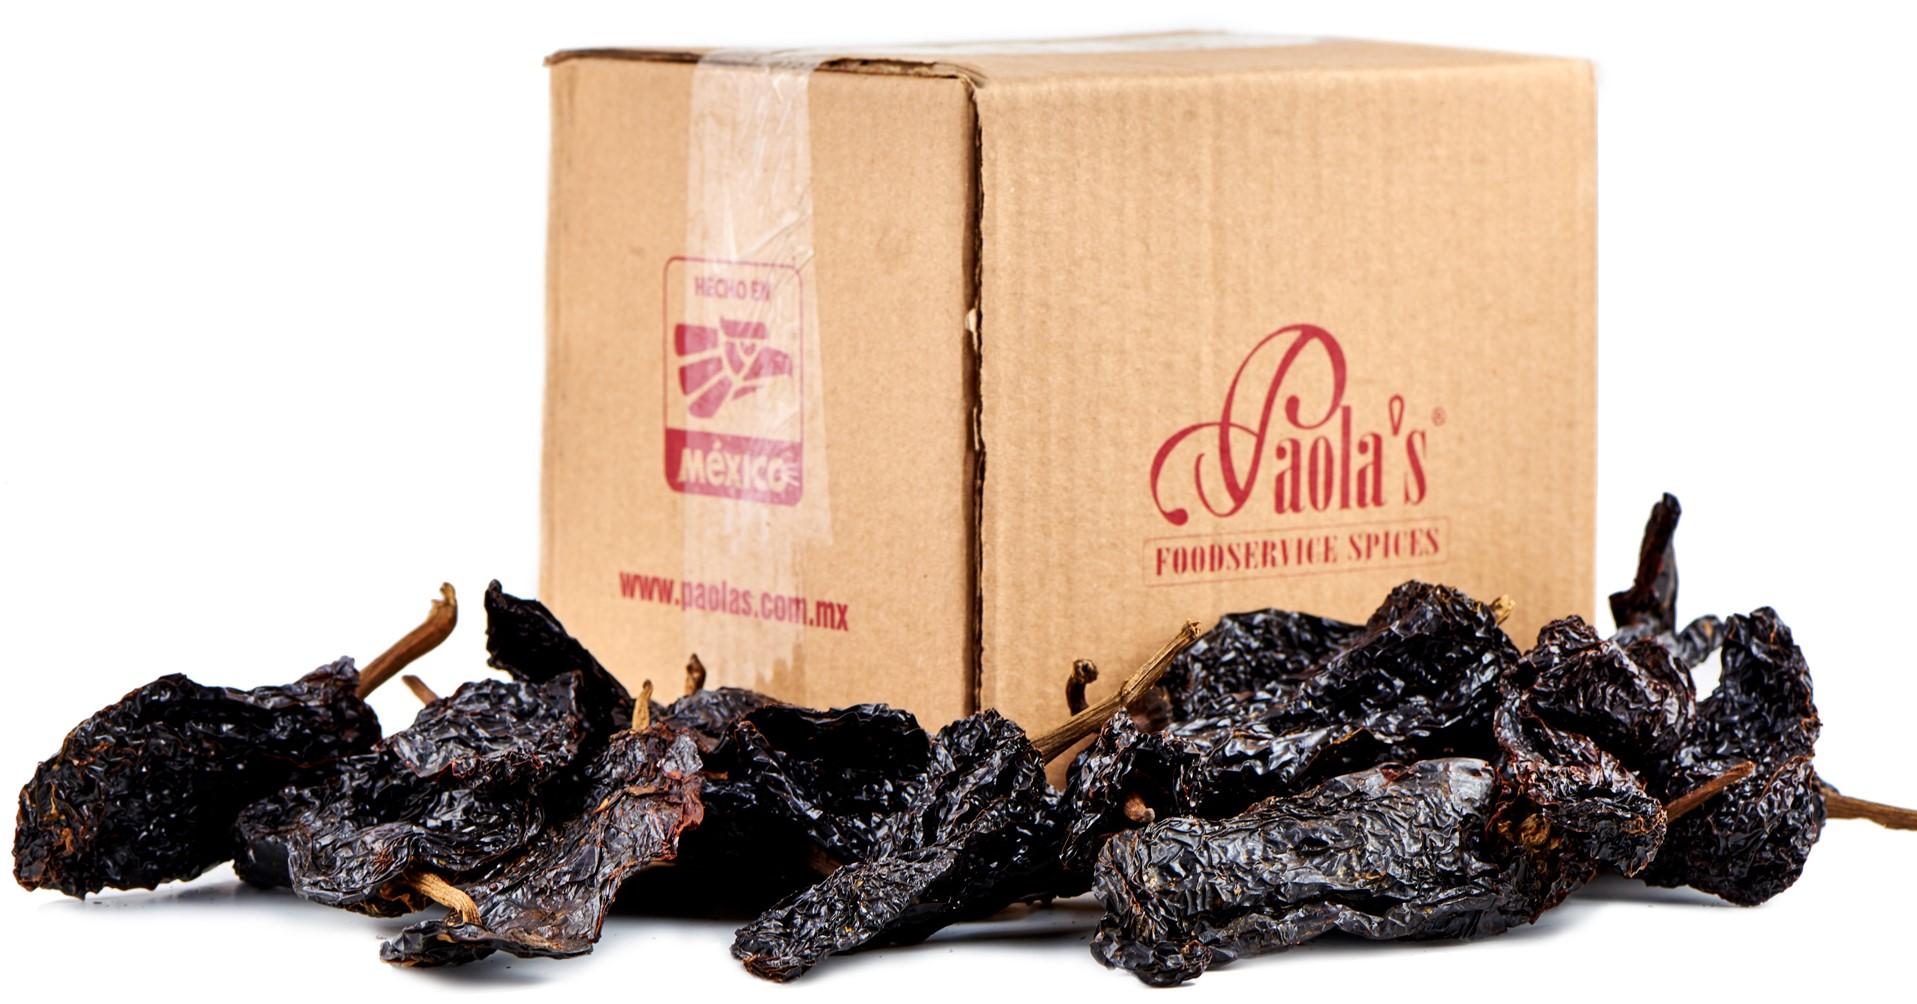 Chili Mulato getrocknet Paolas  1 kg